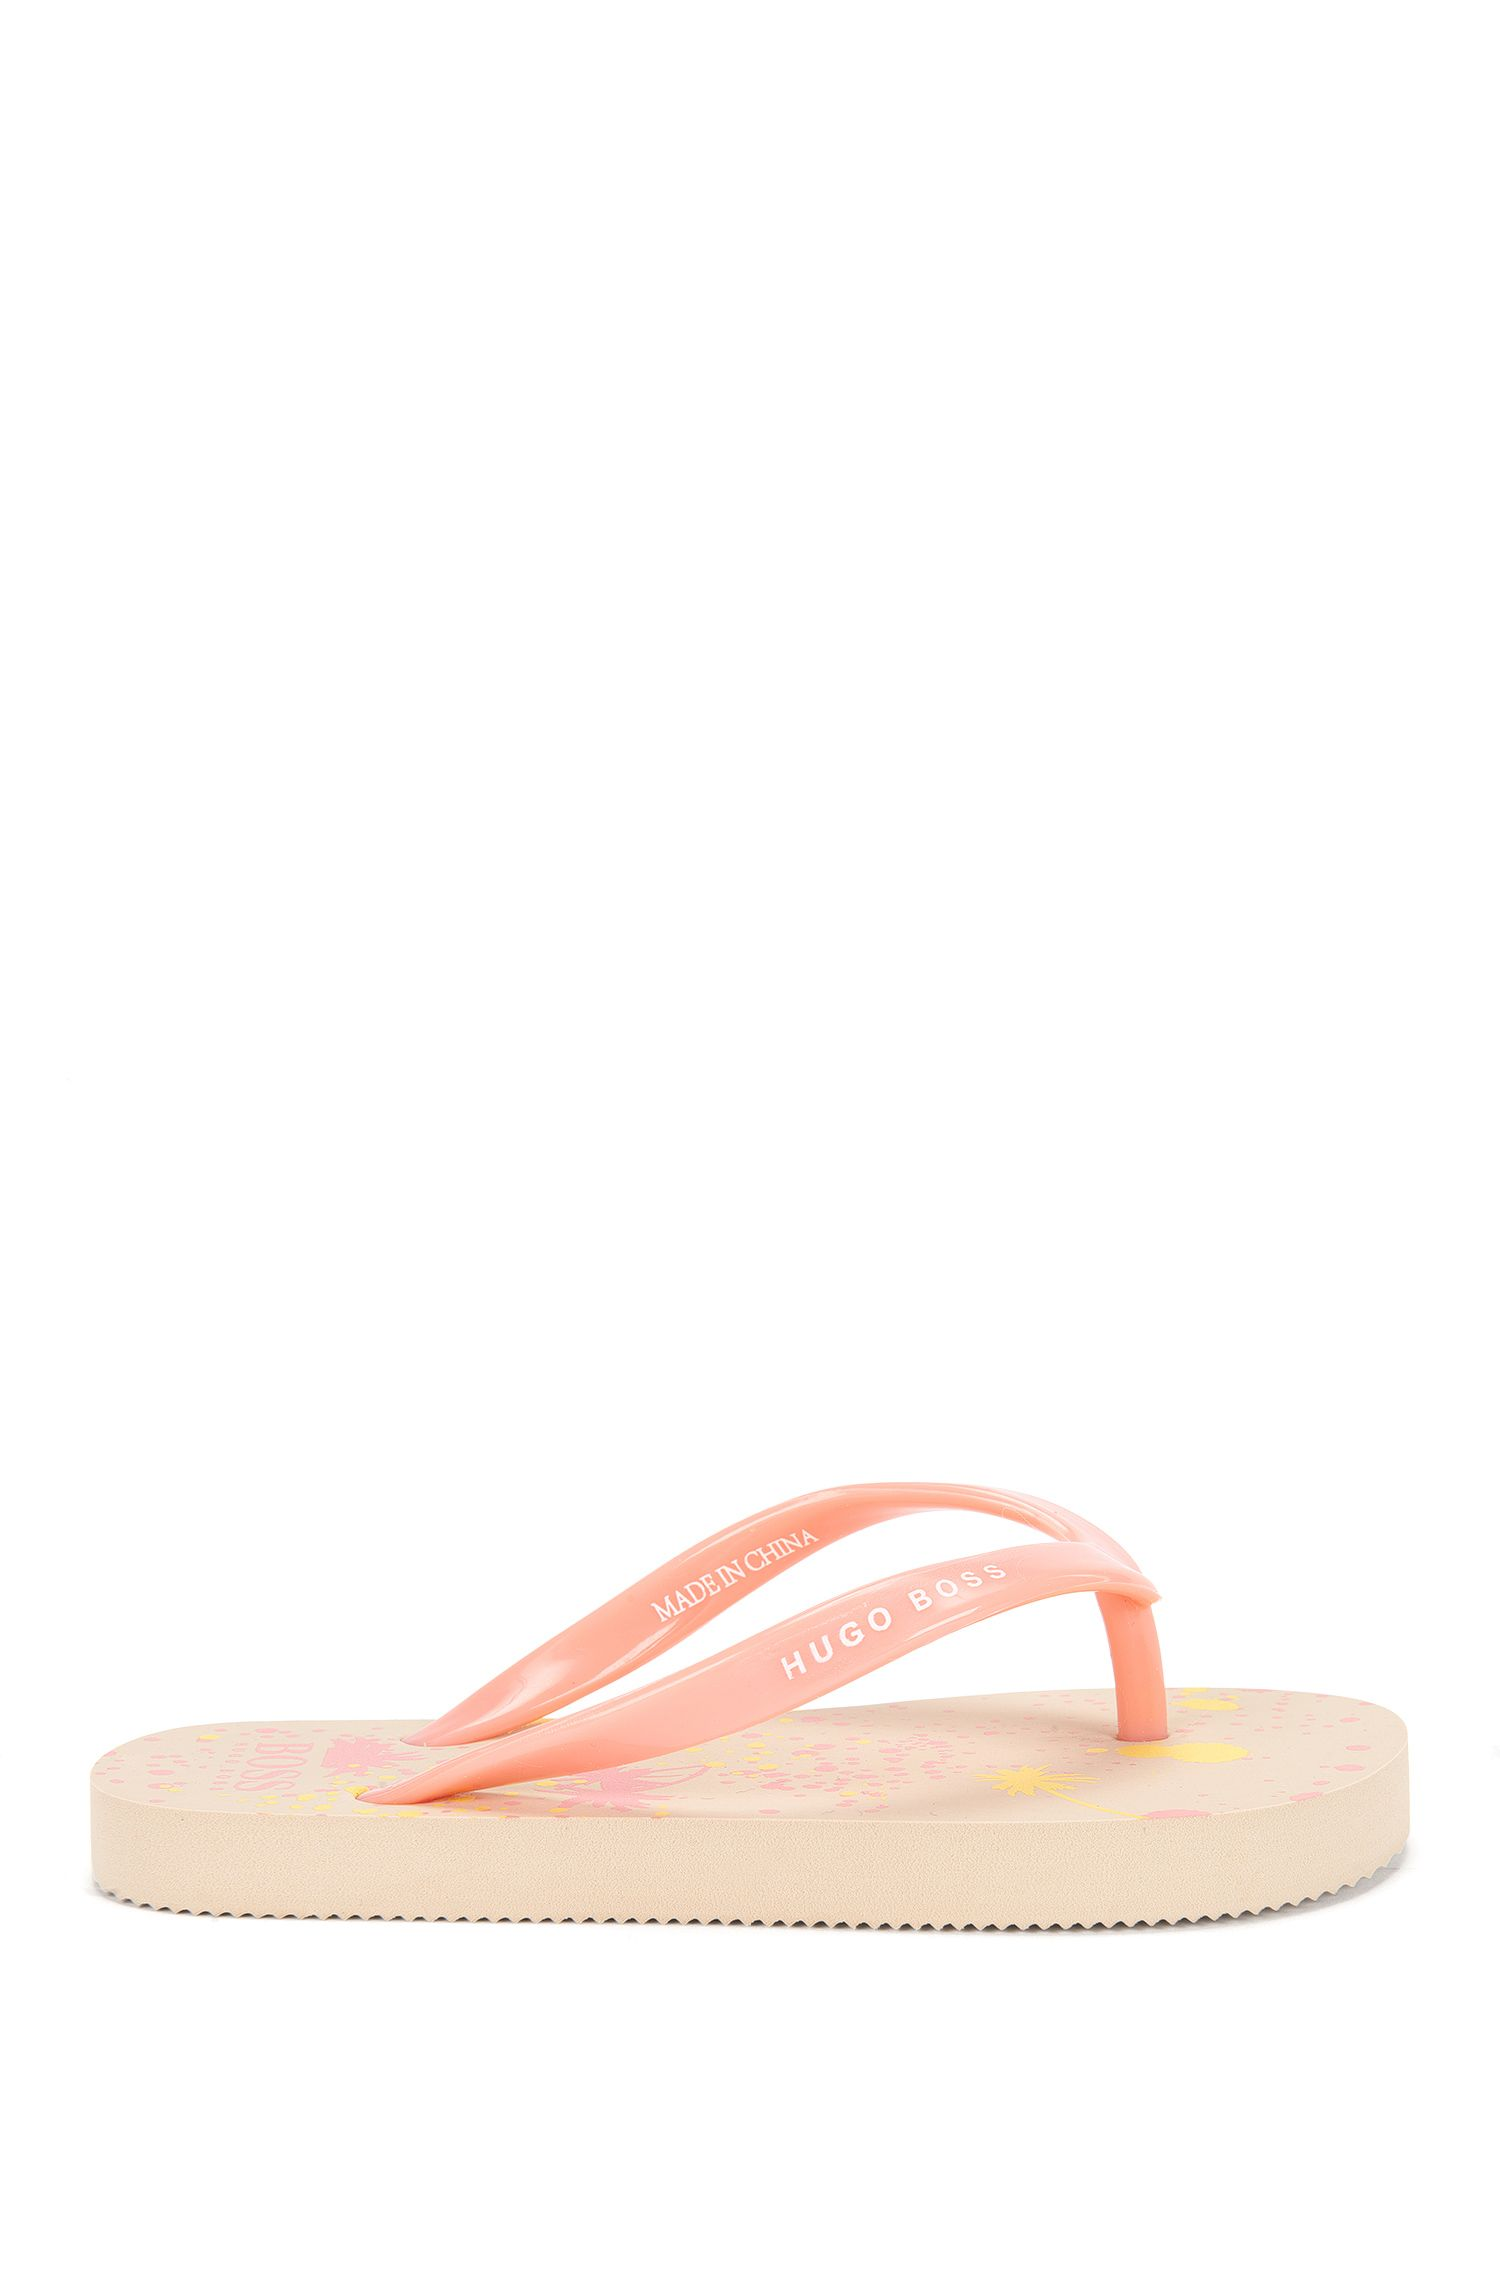 Kids' toe-separator sandals with palm-tree print: 'J19035'